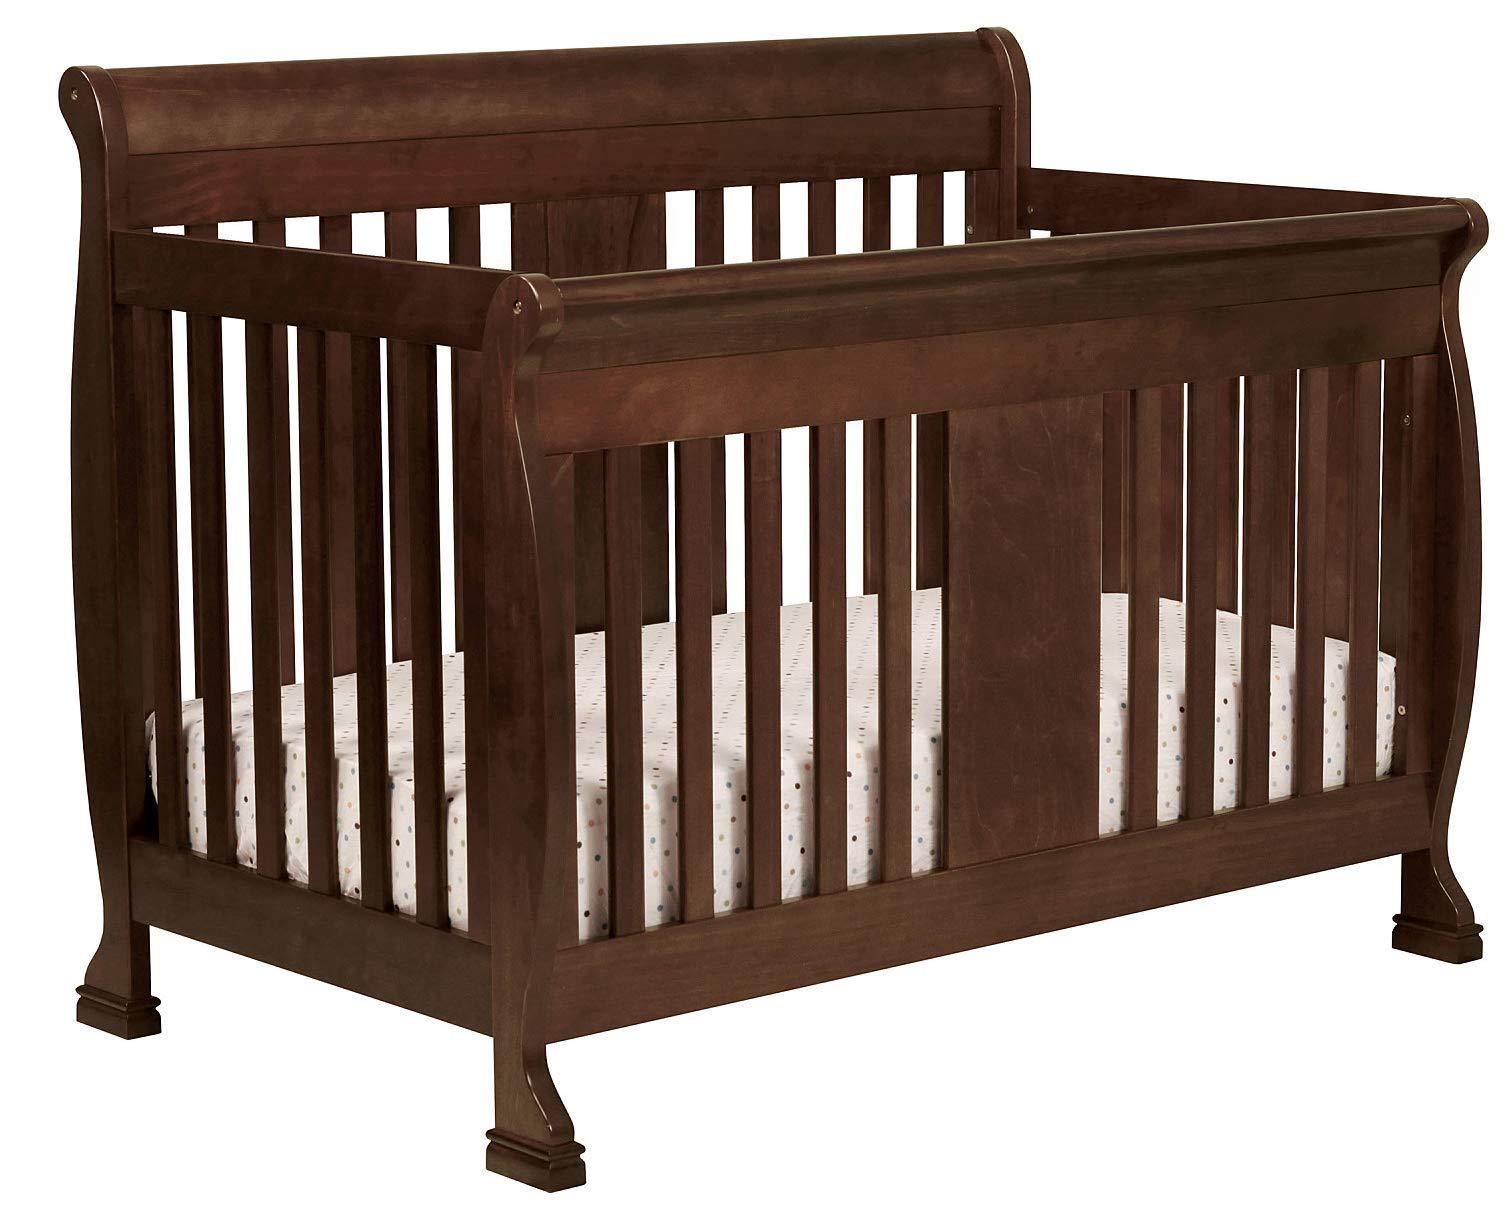 Full Size Conversion Kit Bed Rails for Davinci Porter 4-in-1 Crib - Espresso by CC KITS